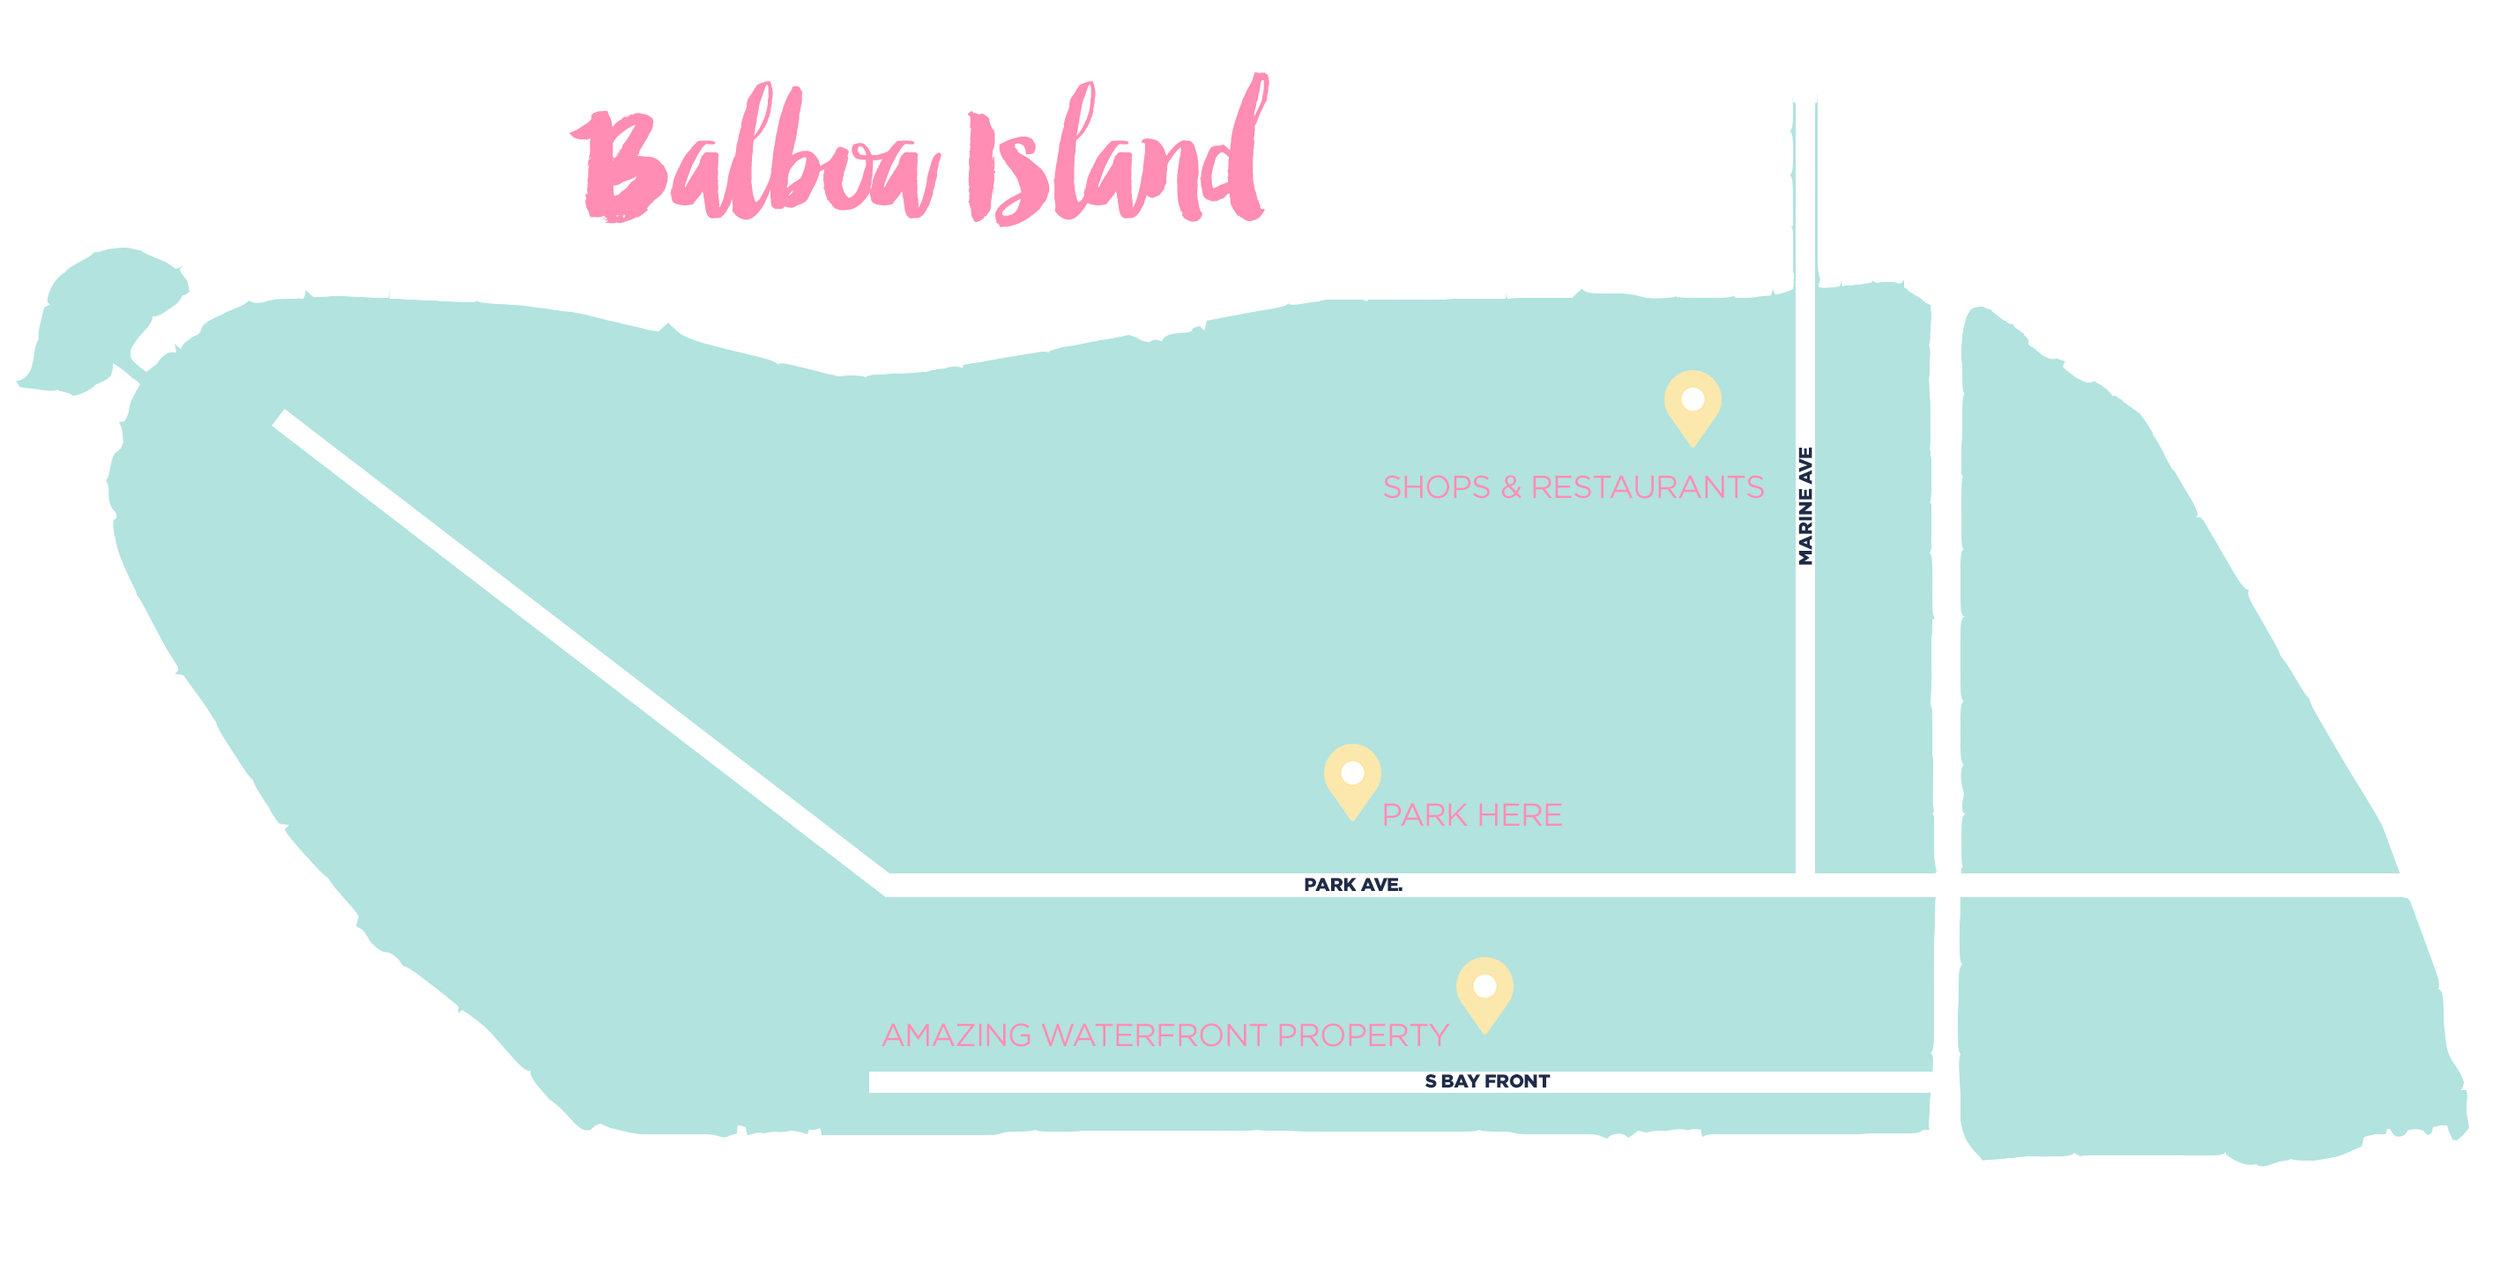 BALBOA ISLAND MAP x www.thetravelpockets.com